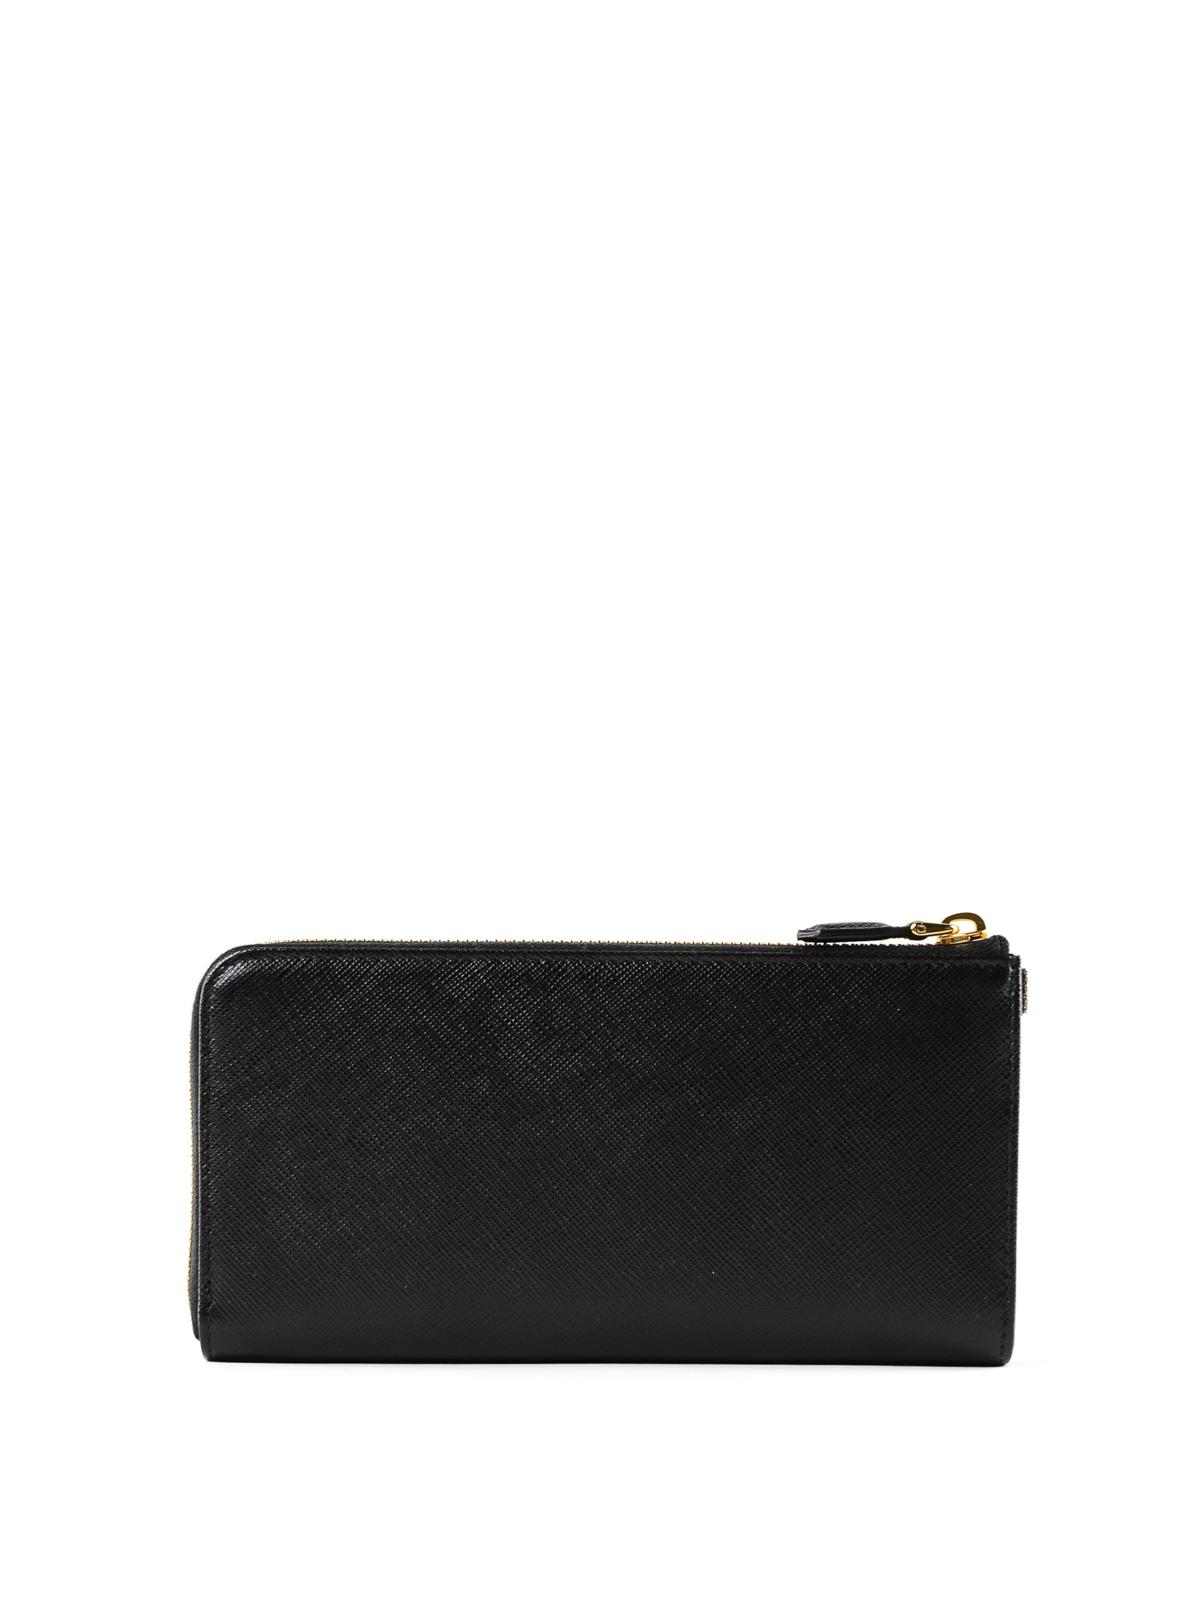 1858f4365e71d9 iKRIX PRADA: wallets & purses - Black Saffiano leather zip around wallet